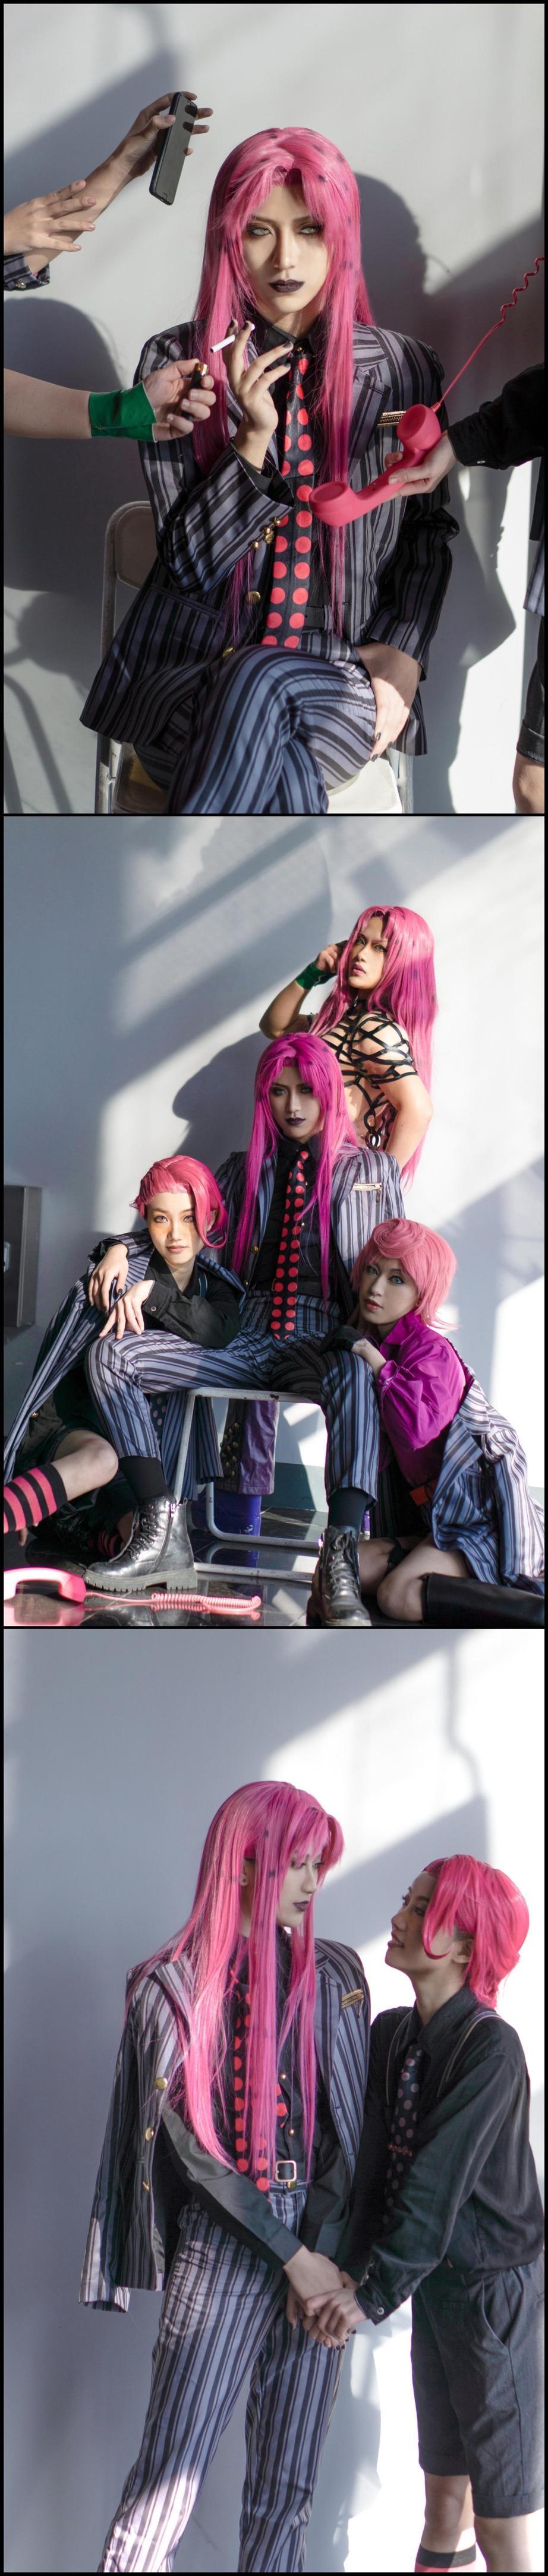 《JOJO的奇妙冒险》漫展cosplay【CN:约拉】-第7张